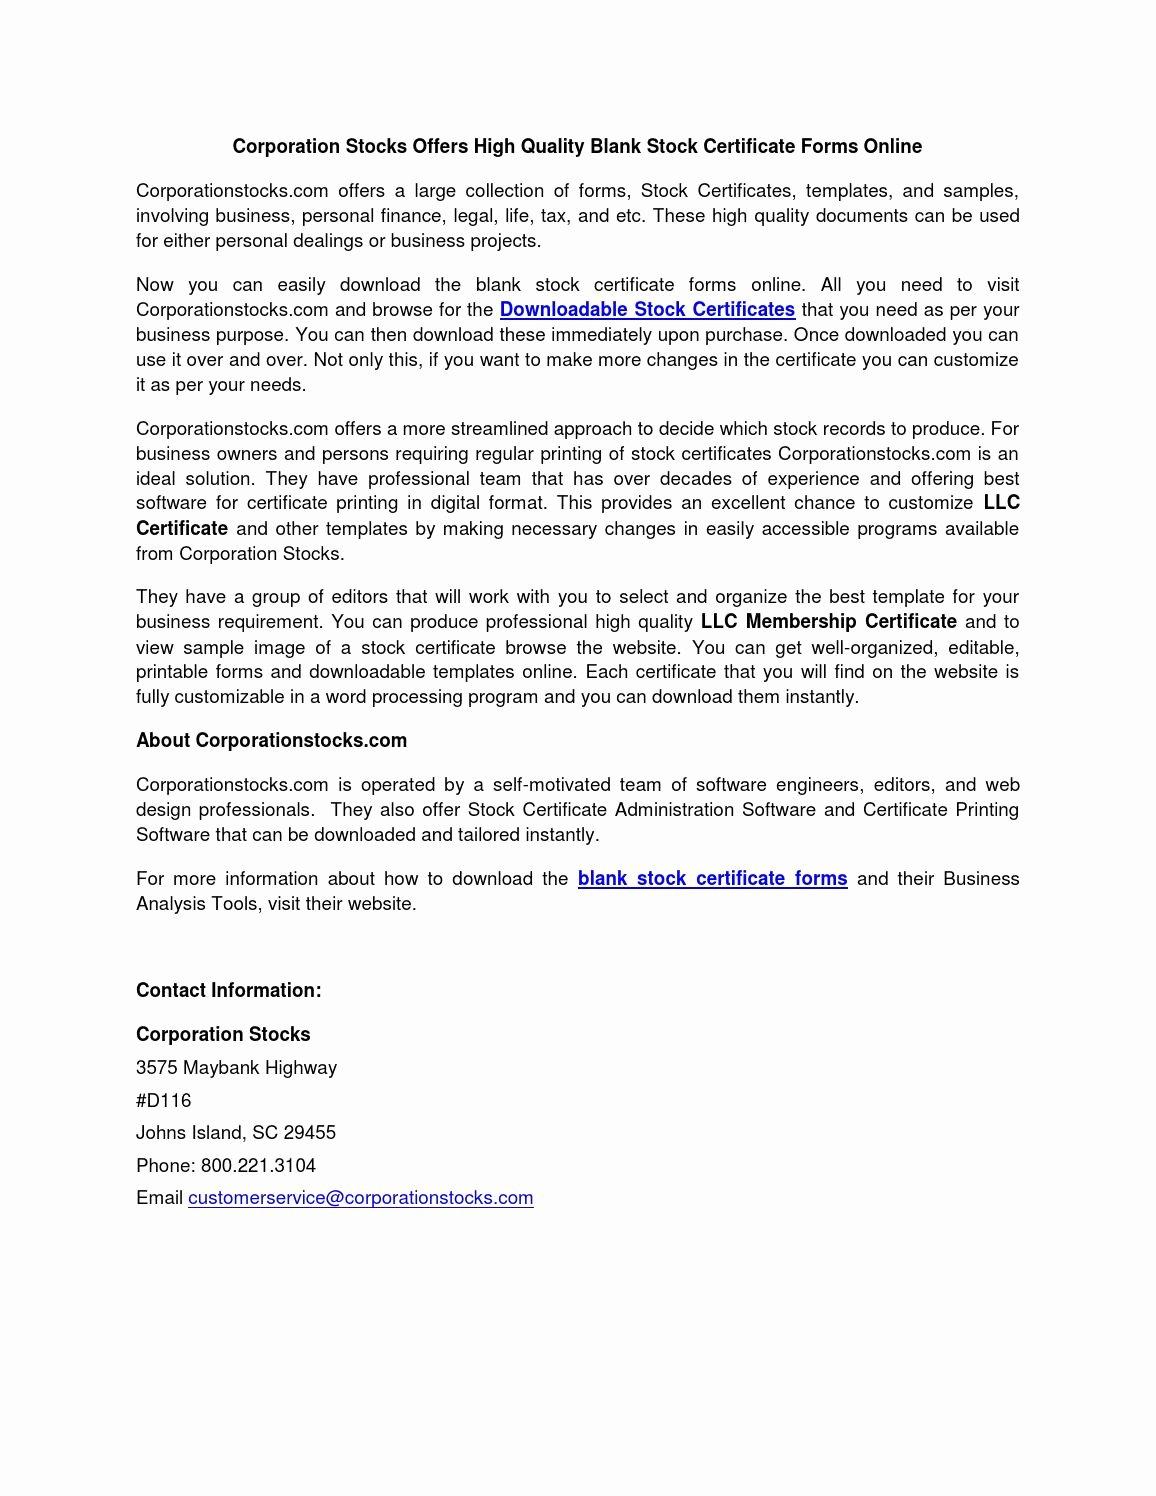 Llc Share Certificate Template New Blank Stock Certificate forms by Bernadette B issuu